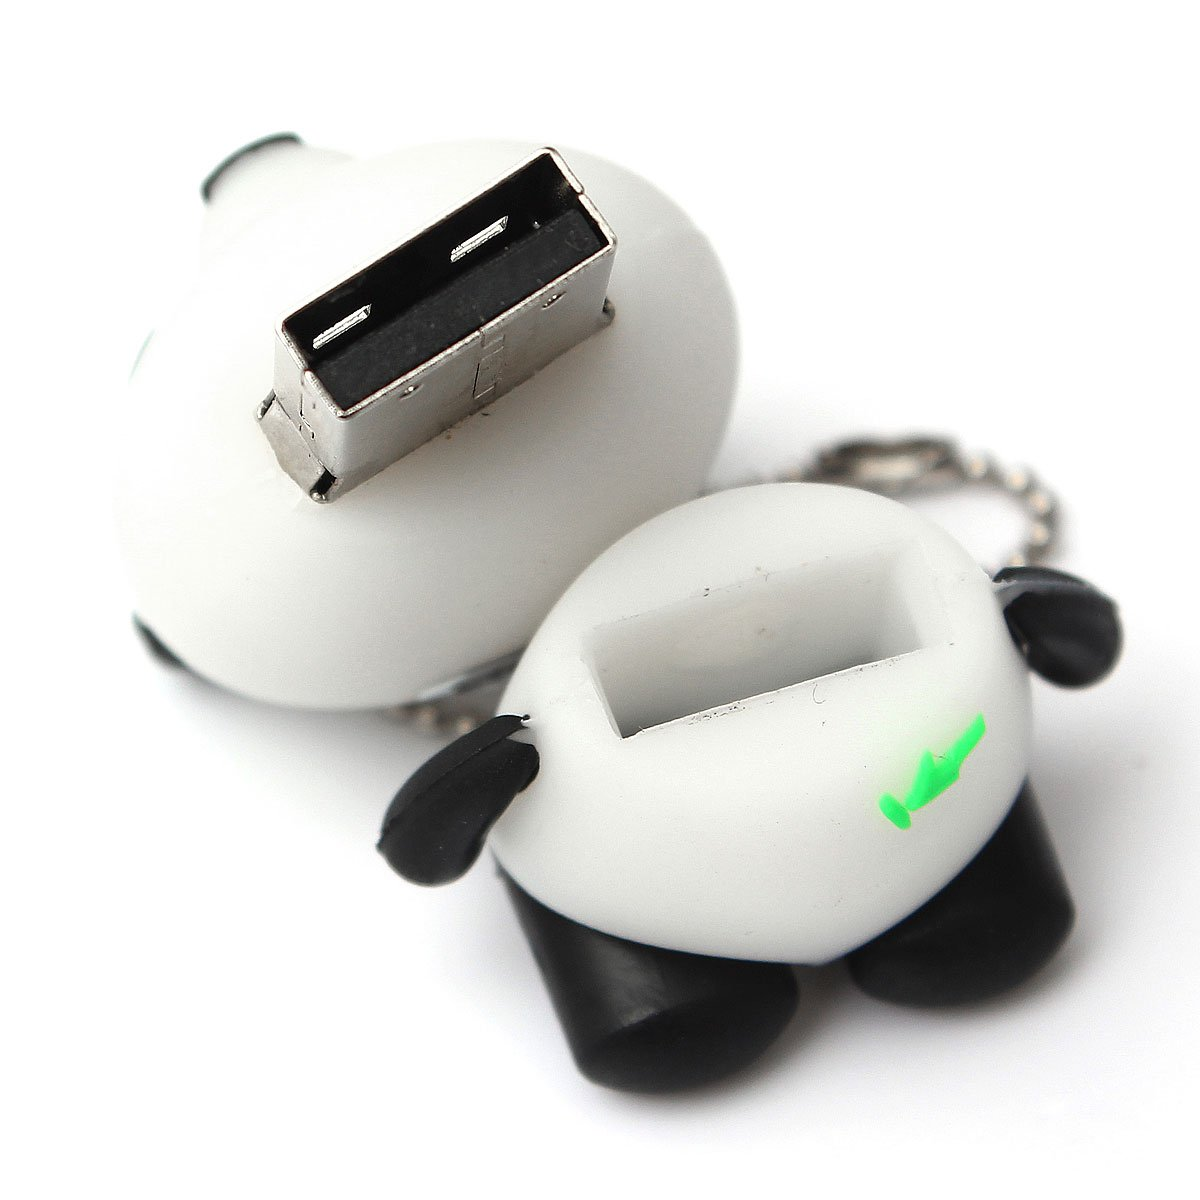 panda cartoon new cute usb flash drive pen drive memory. Black Bedroom Furniture Sets. Home Design Ideas